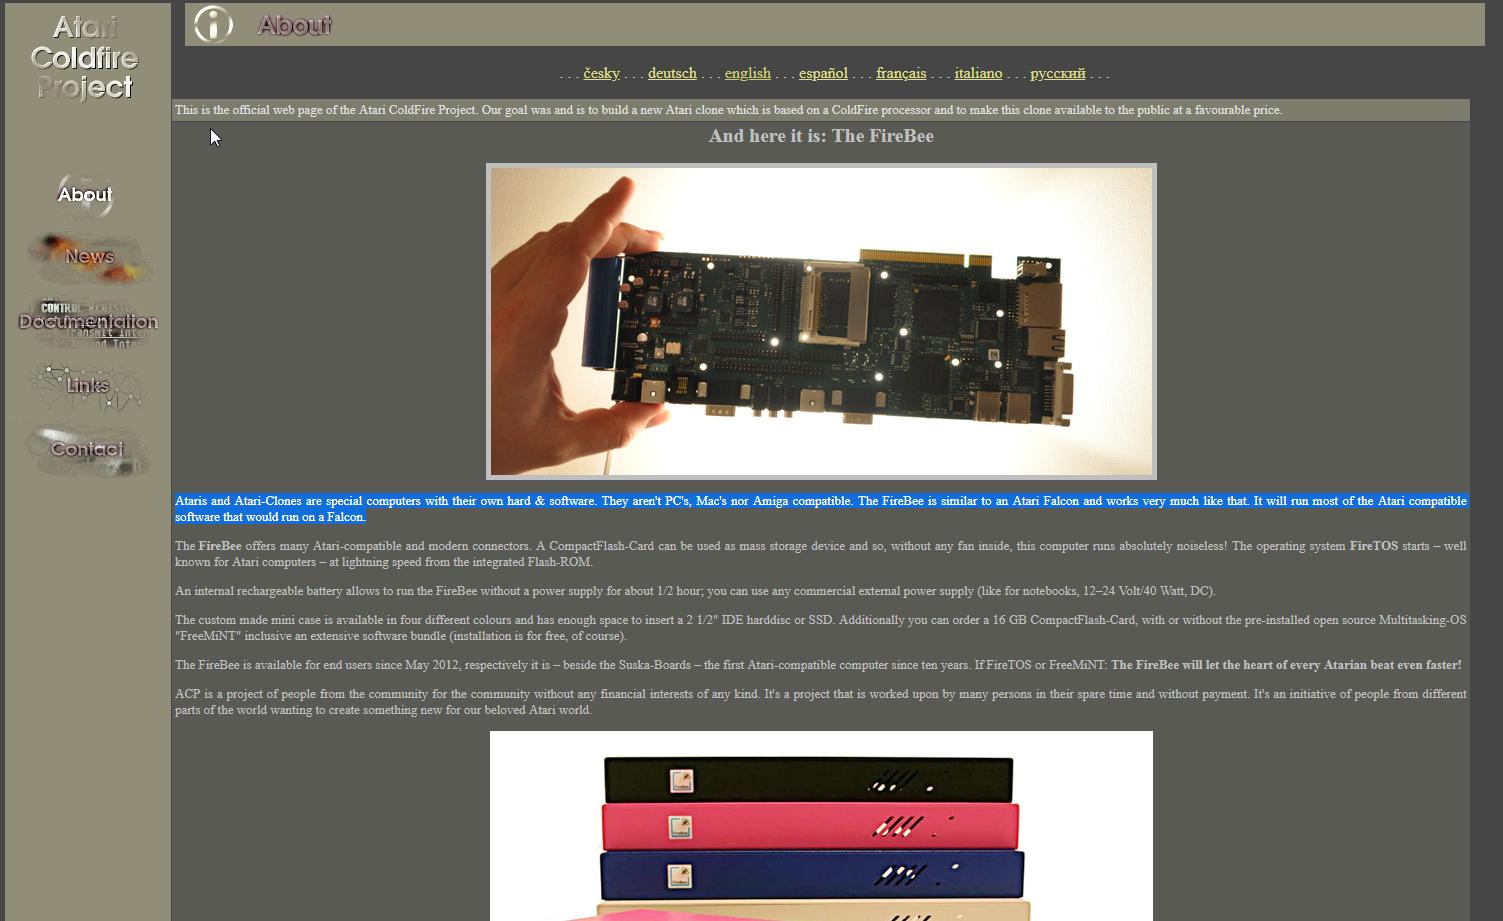 Screenshot of website Atari Coldfire project